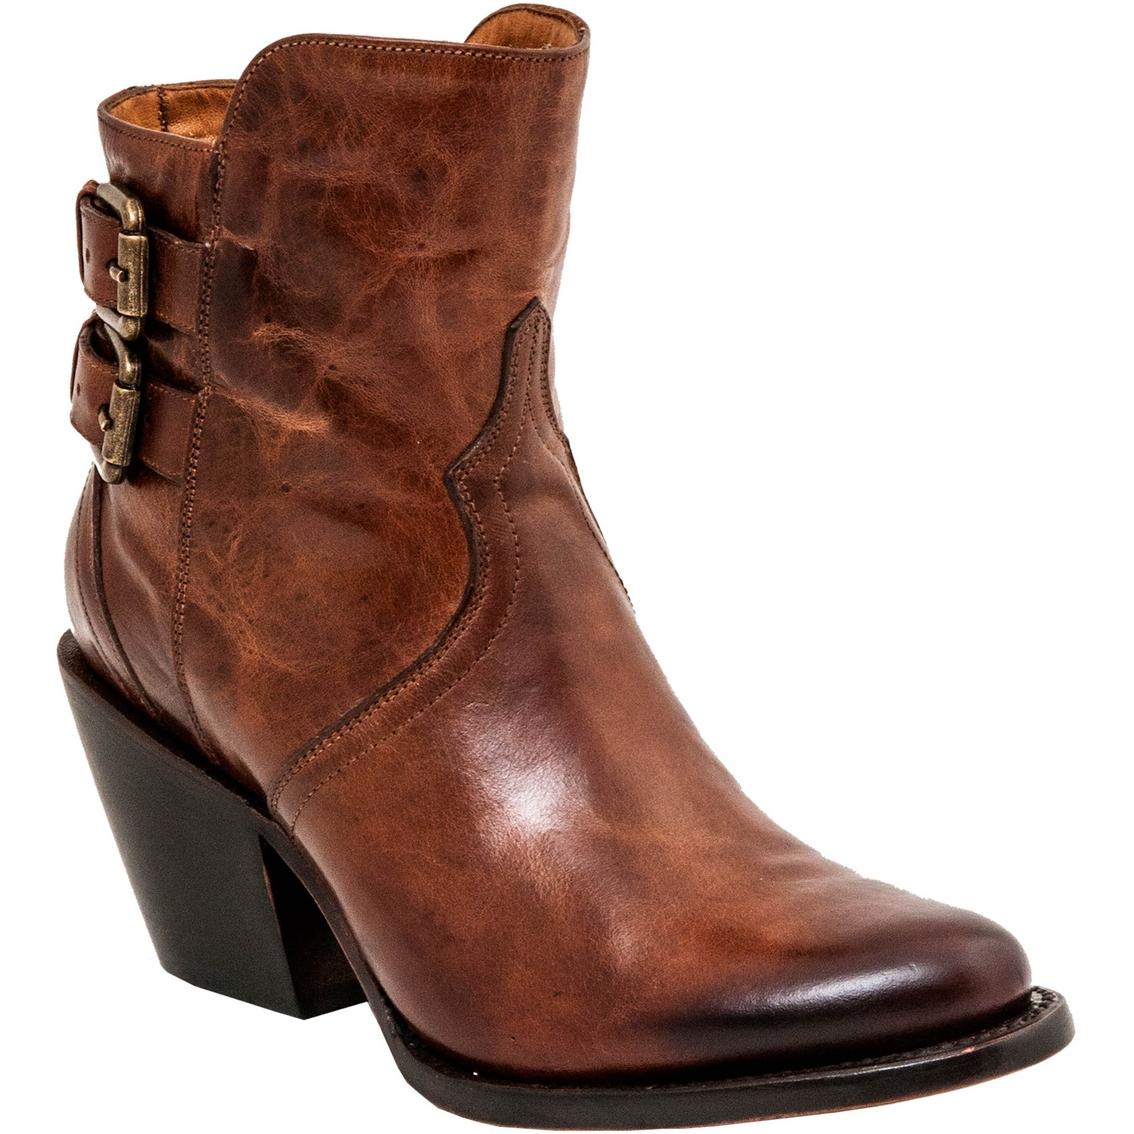 Model Lucchese Womenu0026#39;s Coffee Lunar Calf Savina Ankle Short Cowboy Boot